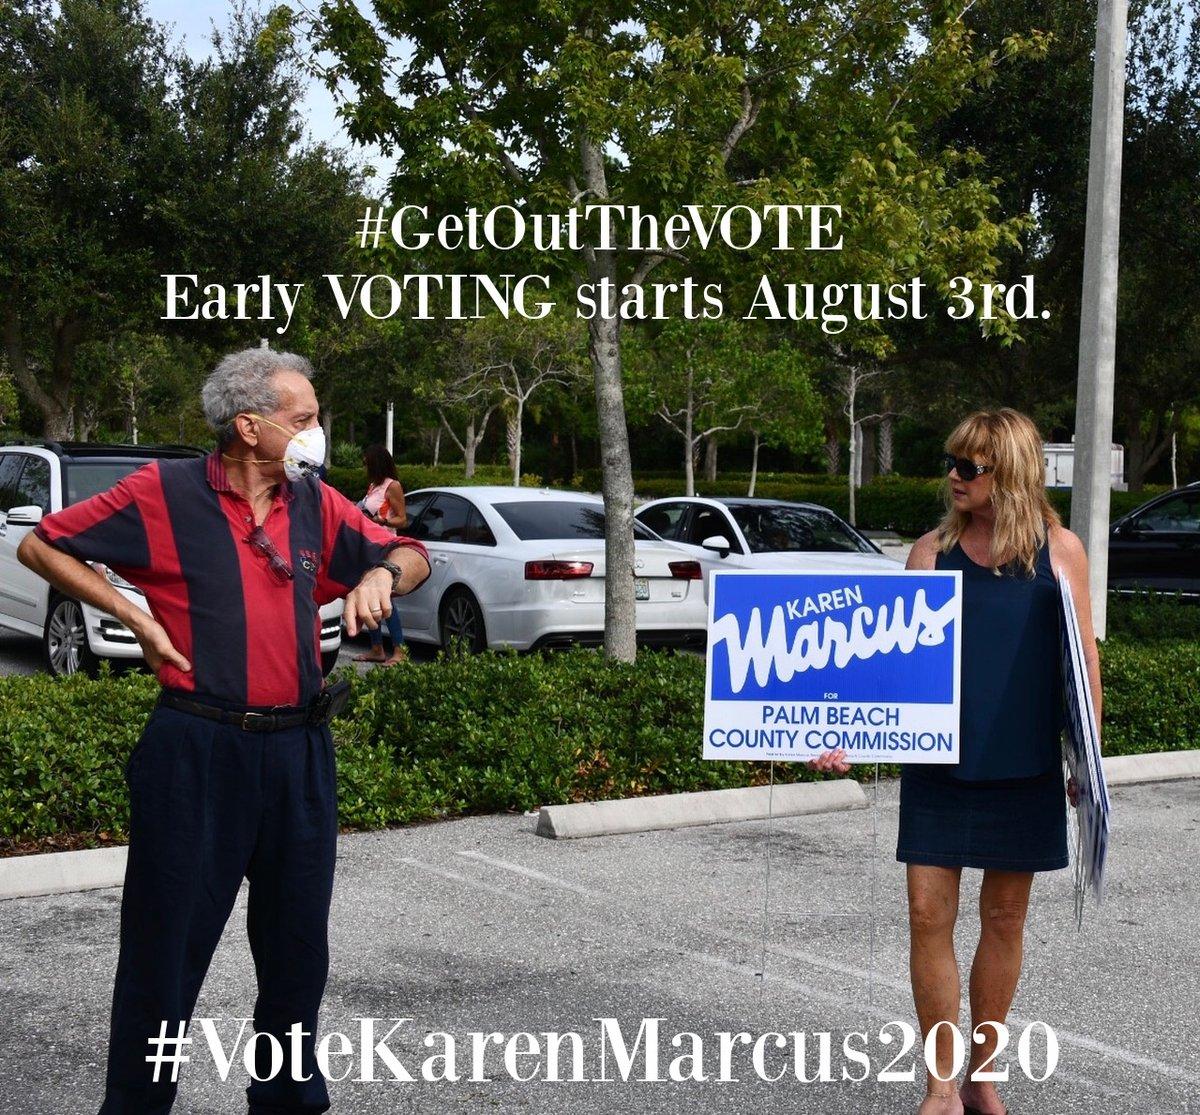 KarenMarcus16 photo